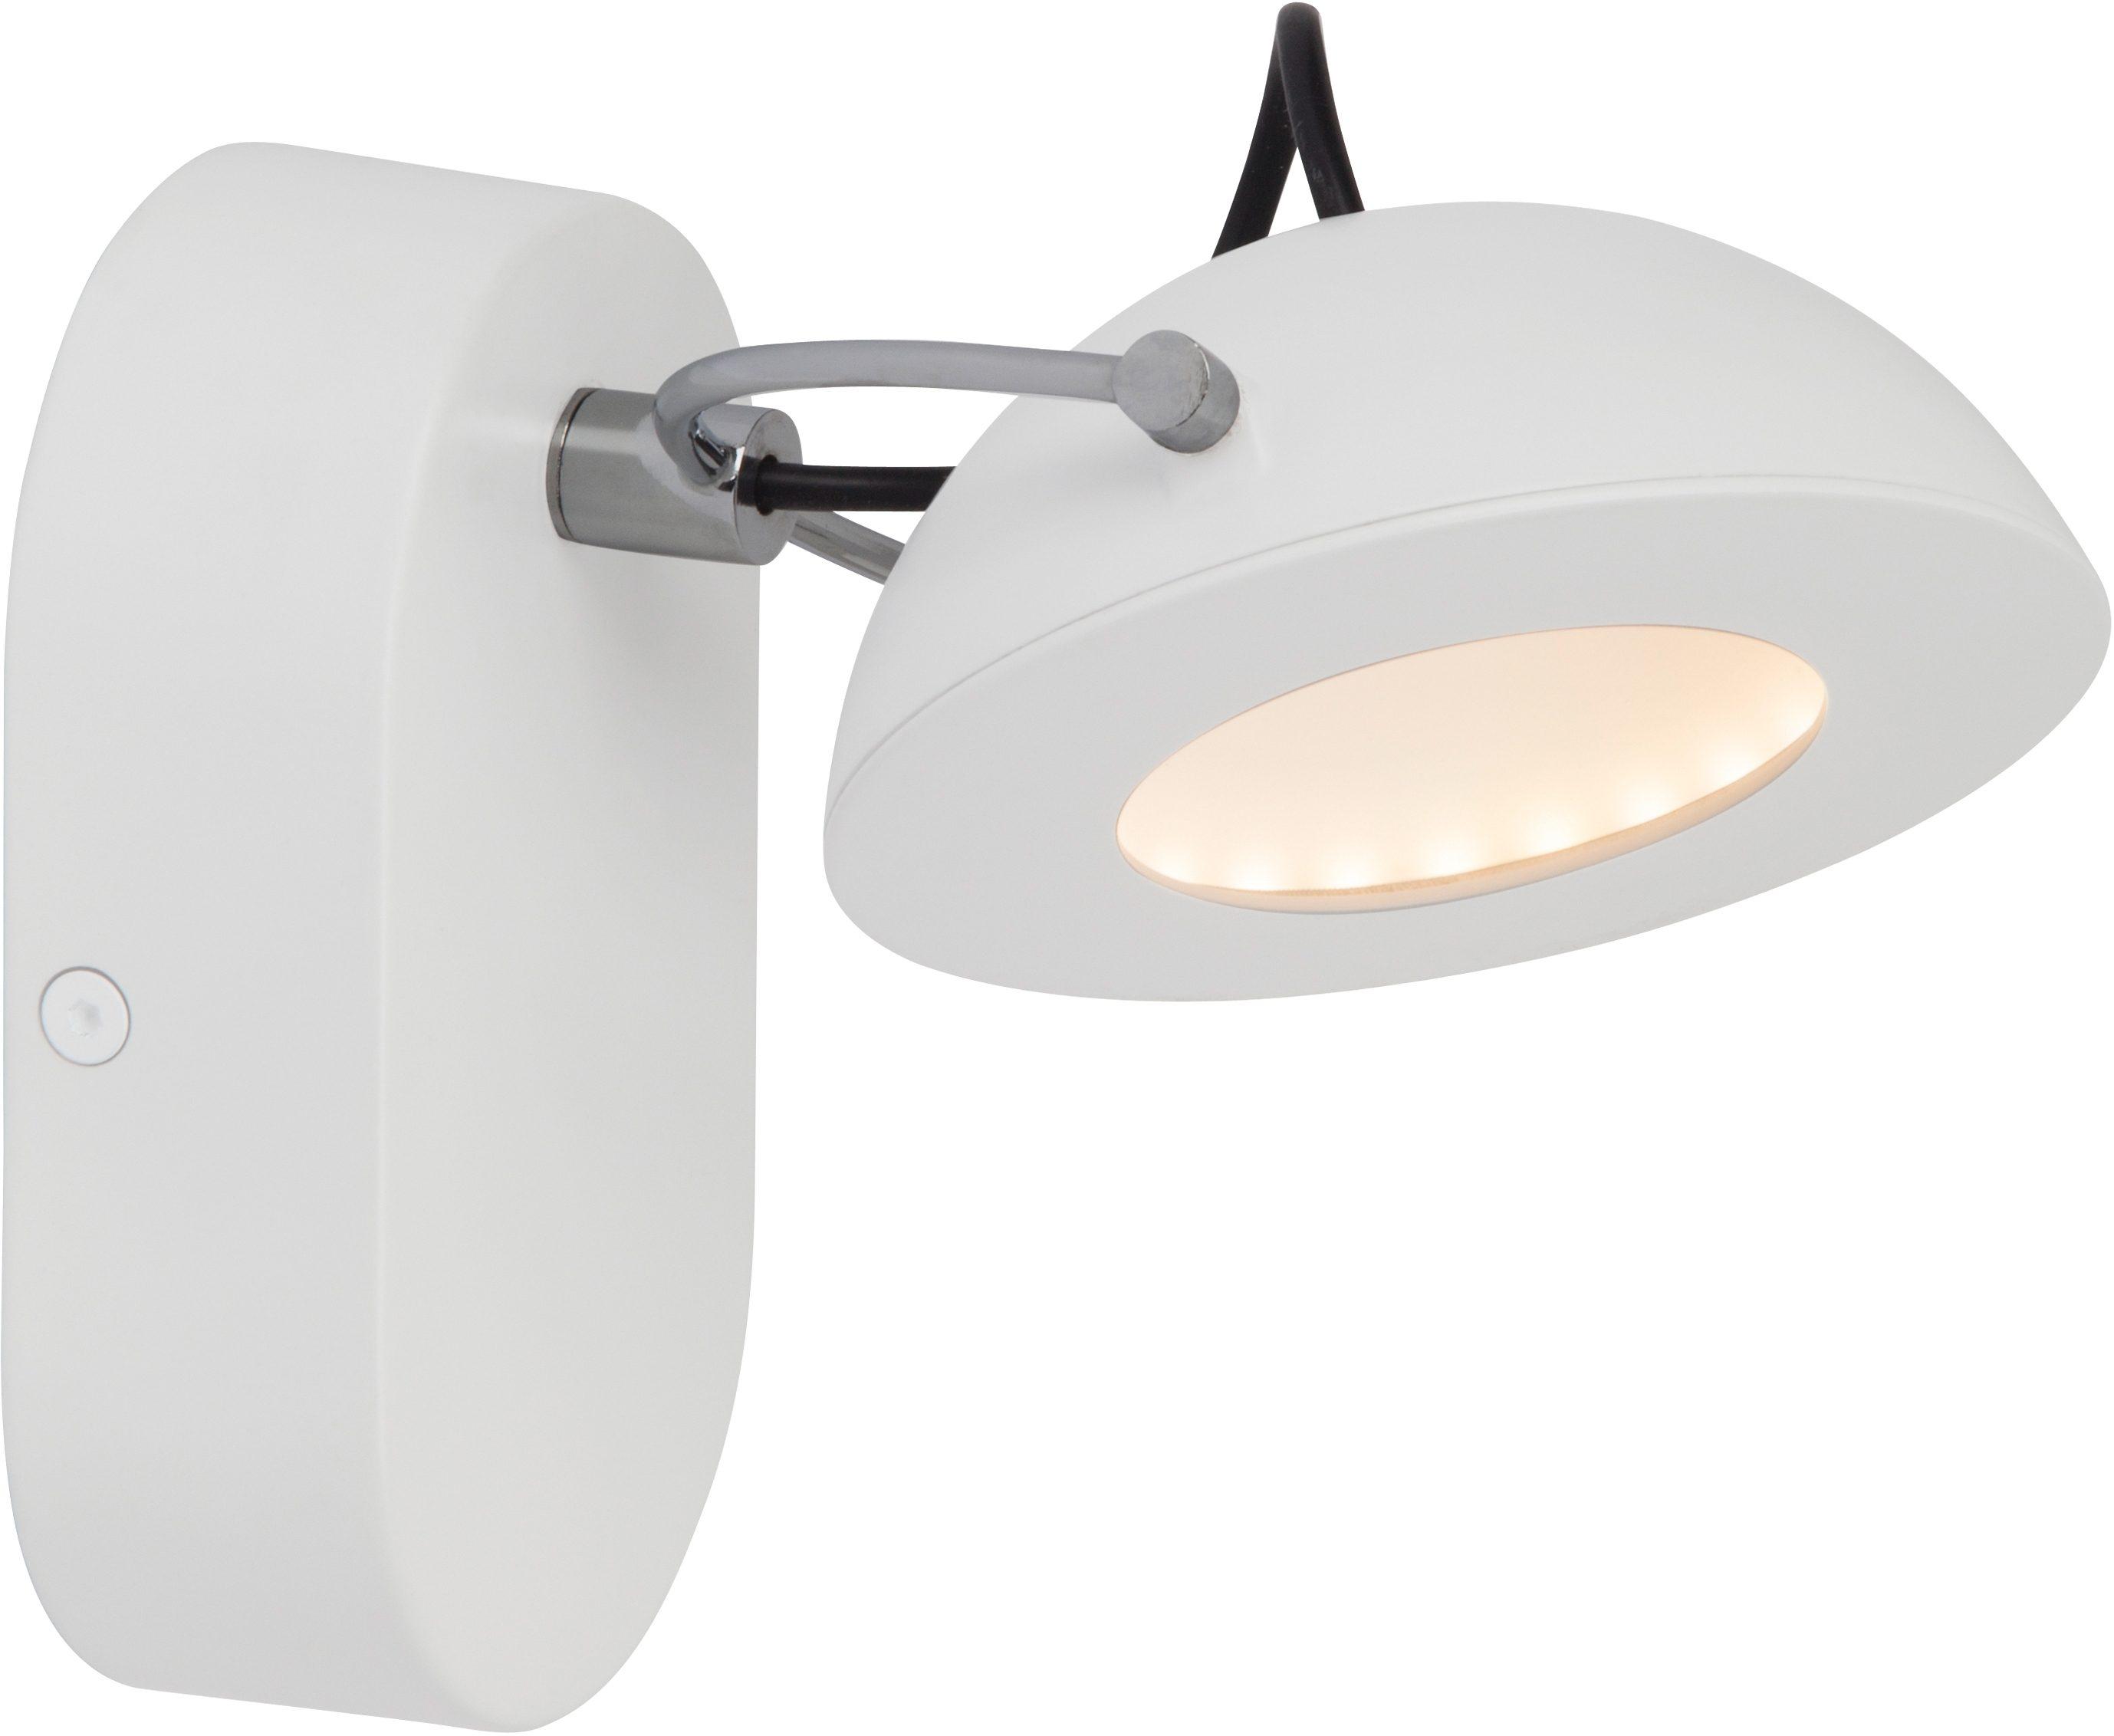 AEG LED Wandleuchte, 1flg., »LETORA«